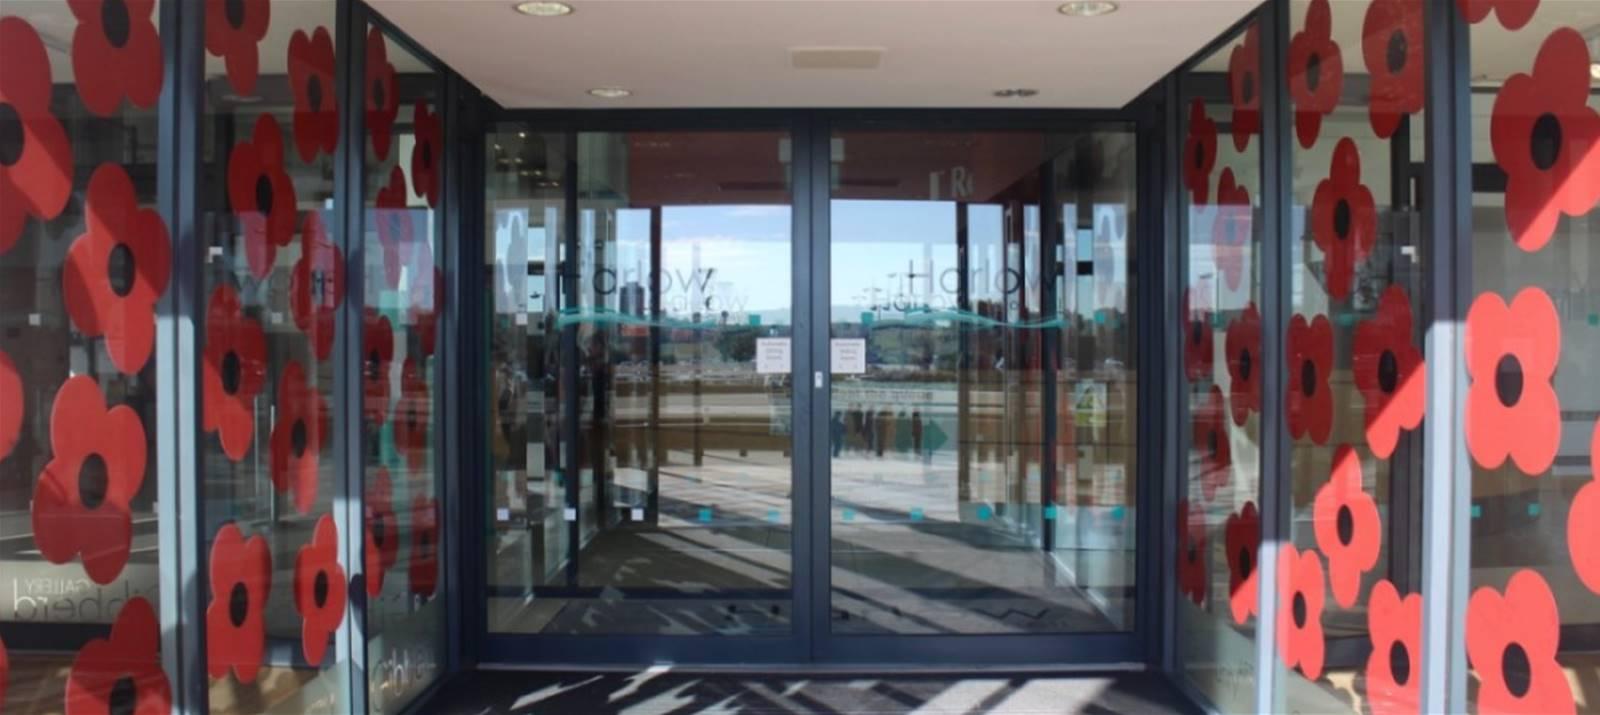 Window Display at Harlow Civic Centre